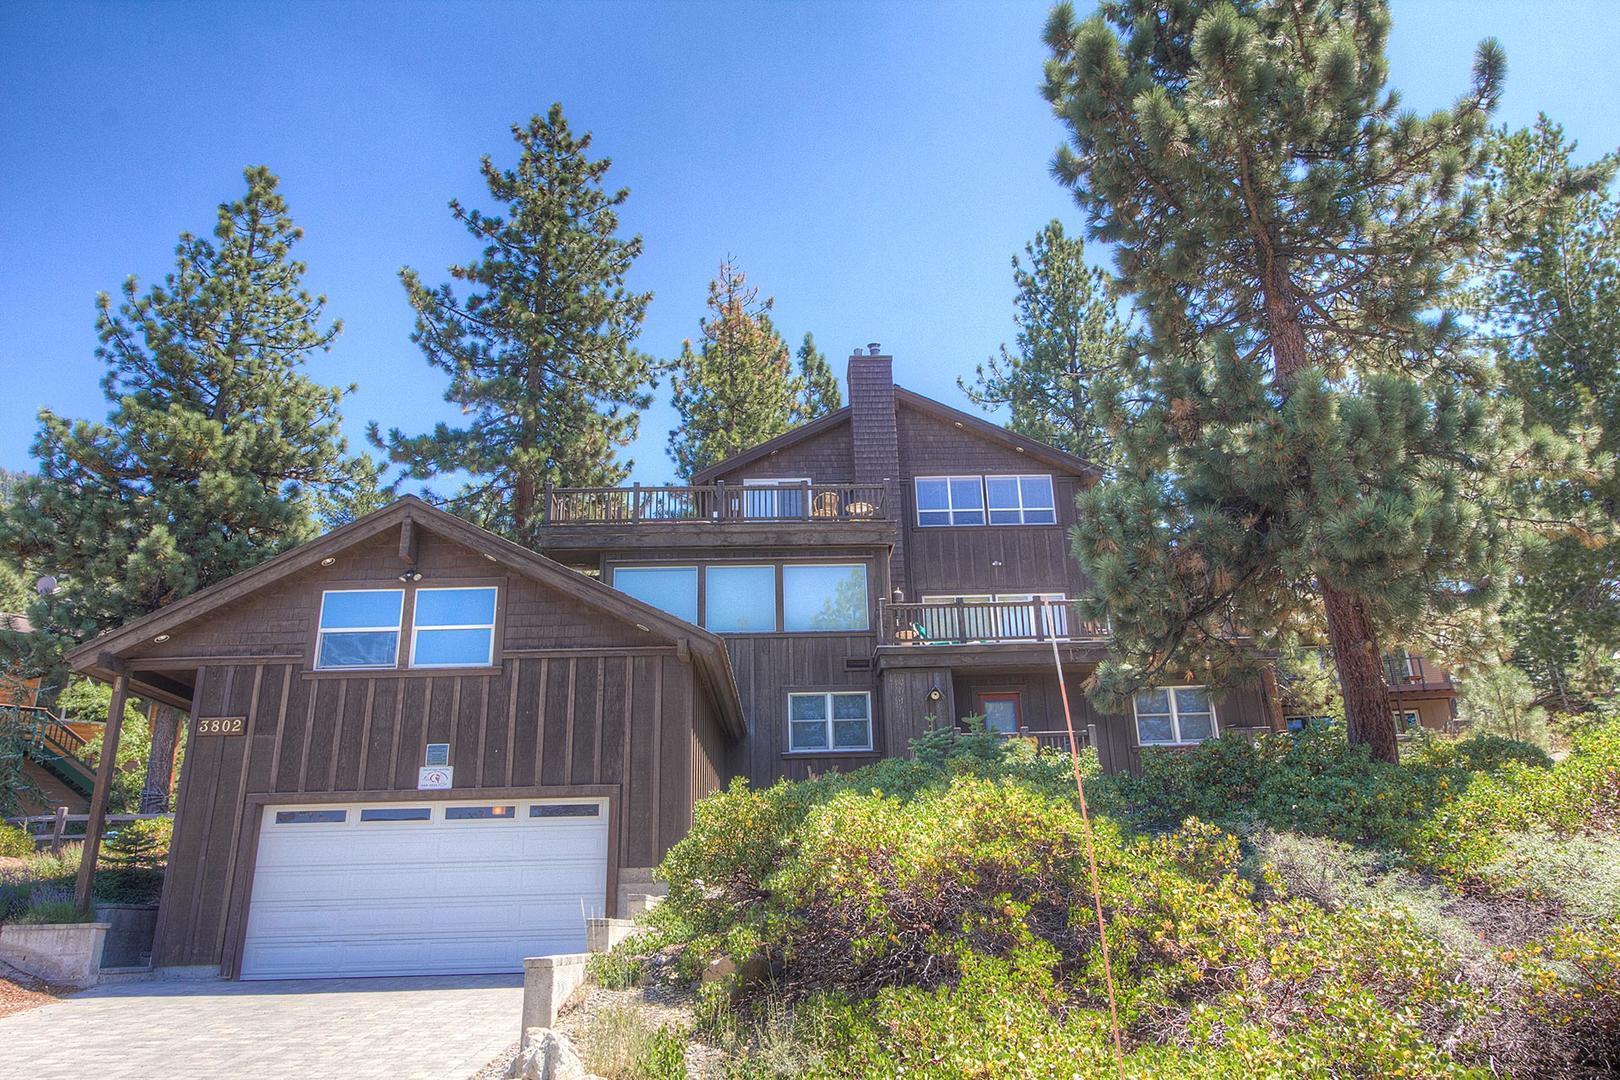 hch1202 lake tahoe vacation rental